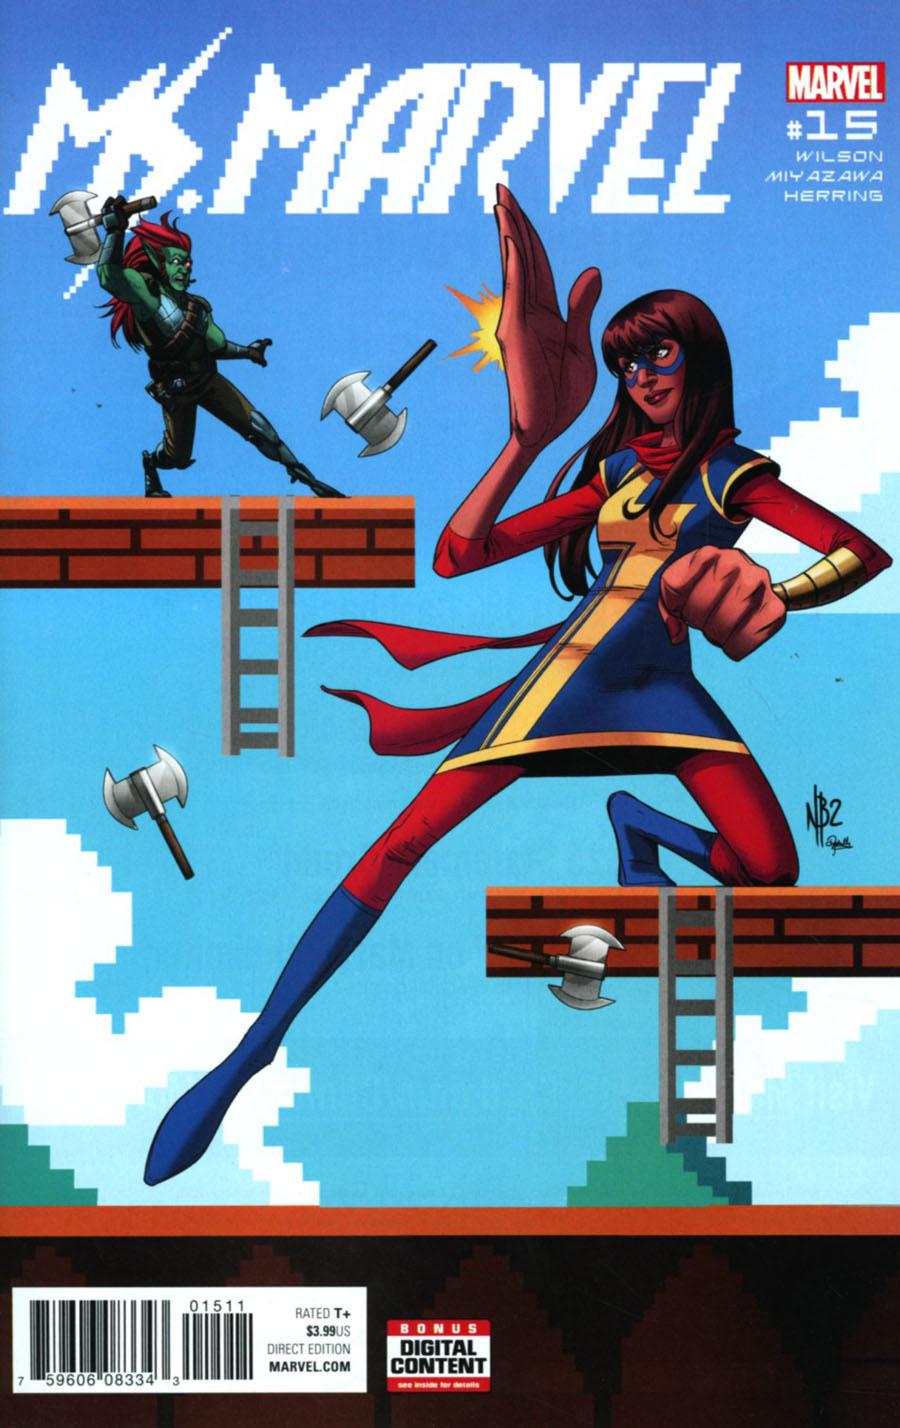 Ms Marvel Vol 4 #15